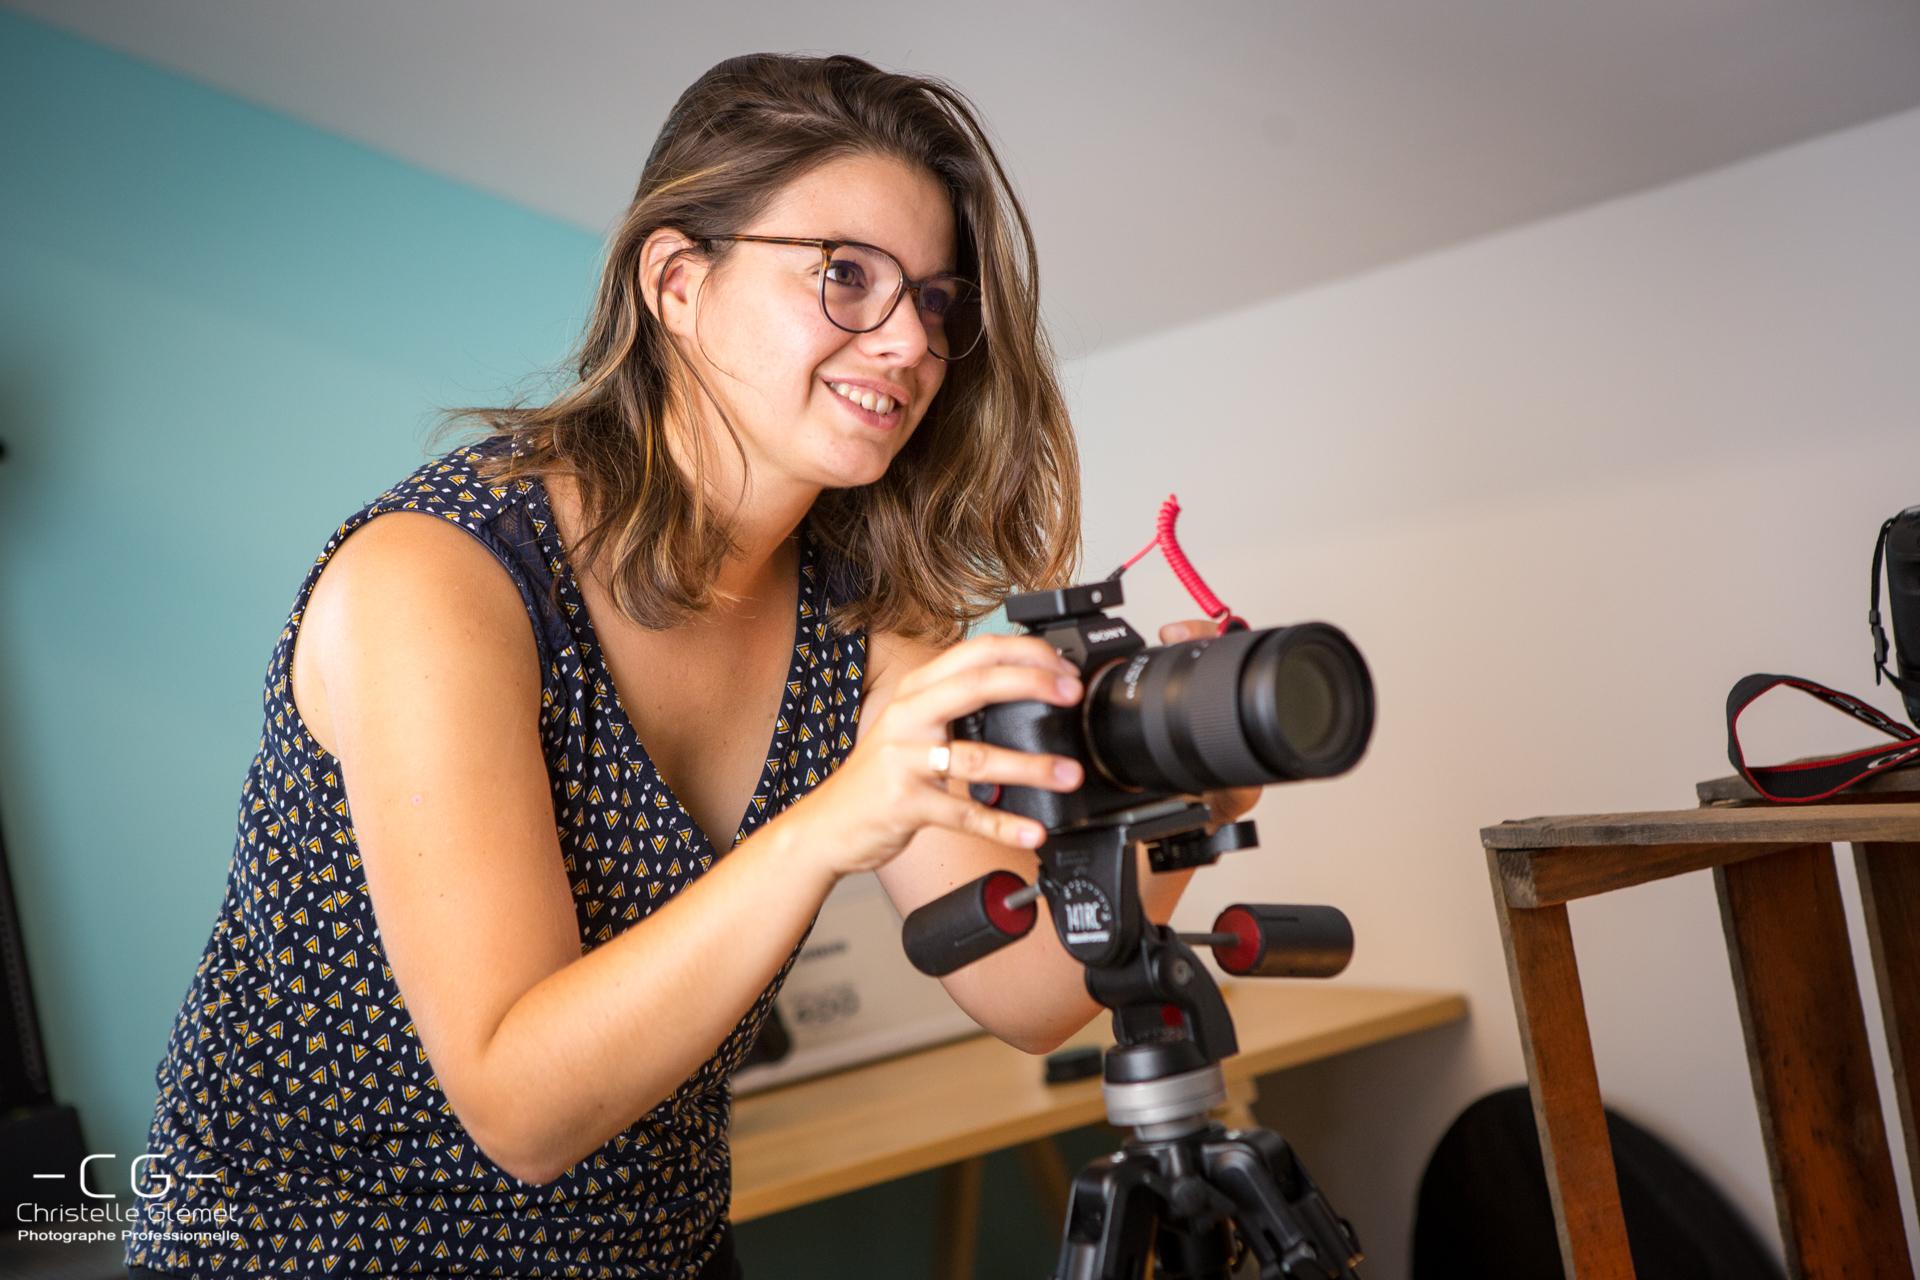 Tournage-photographe-clap&cut